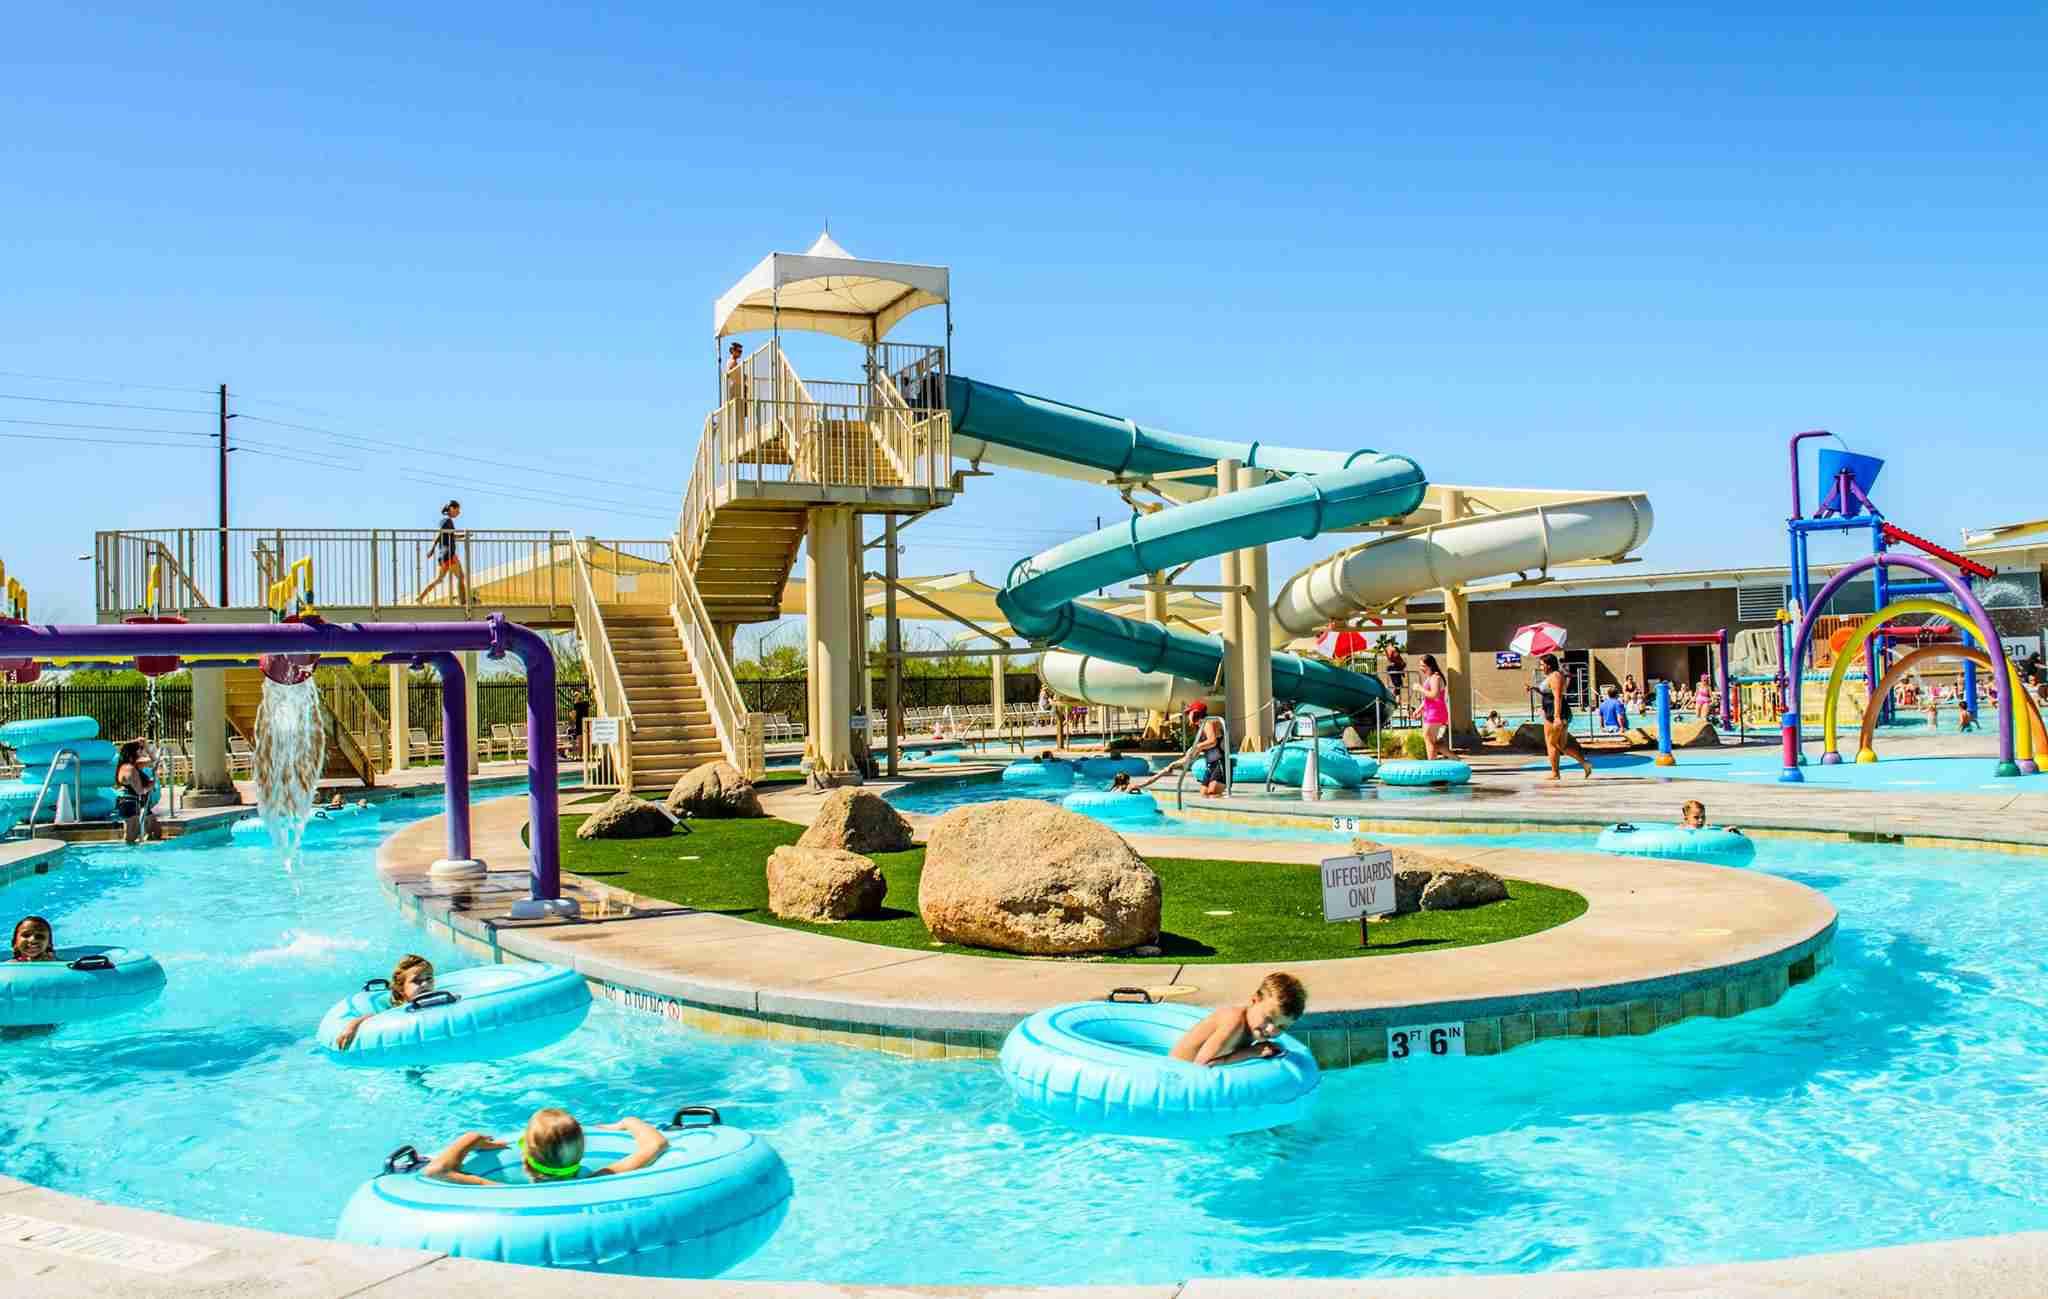 Hamilton Aquatic Center pool